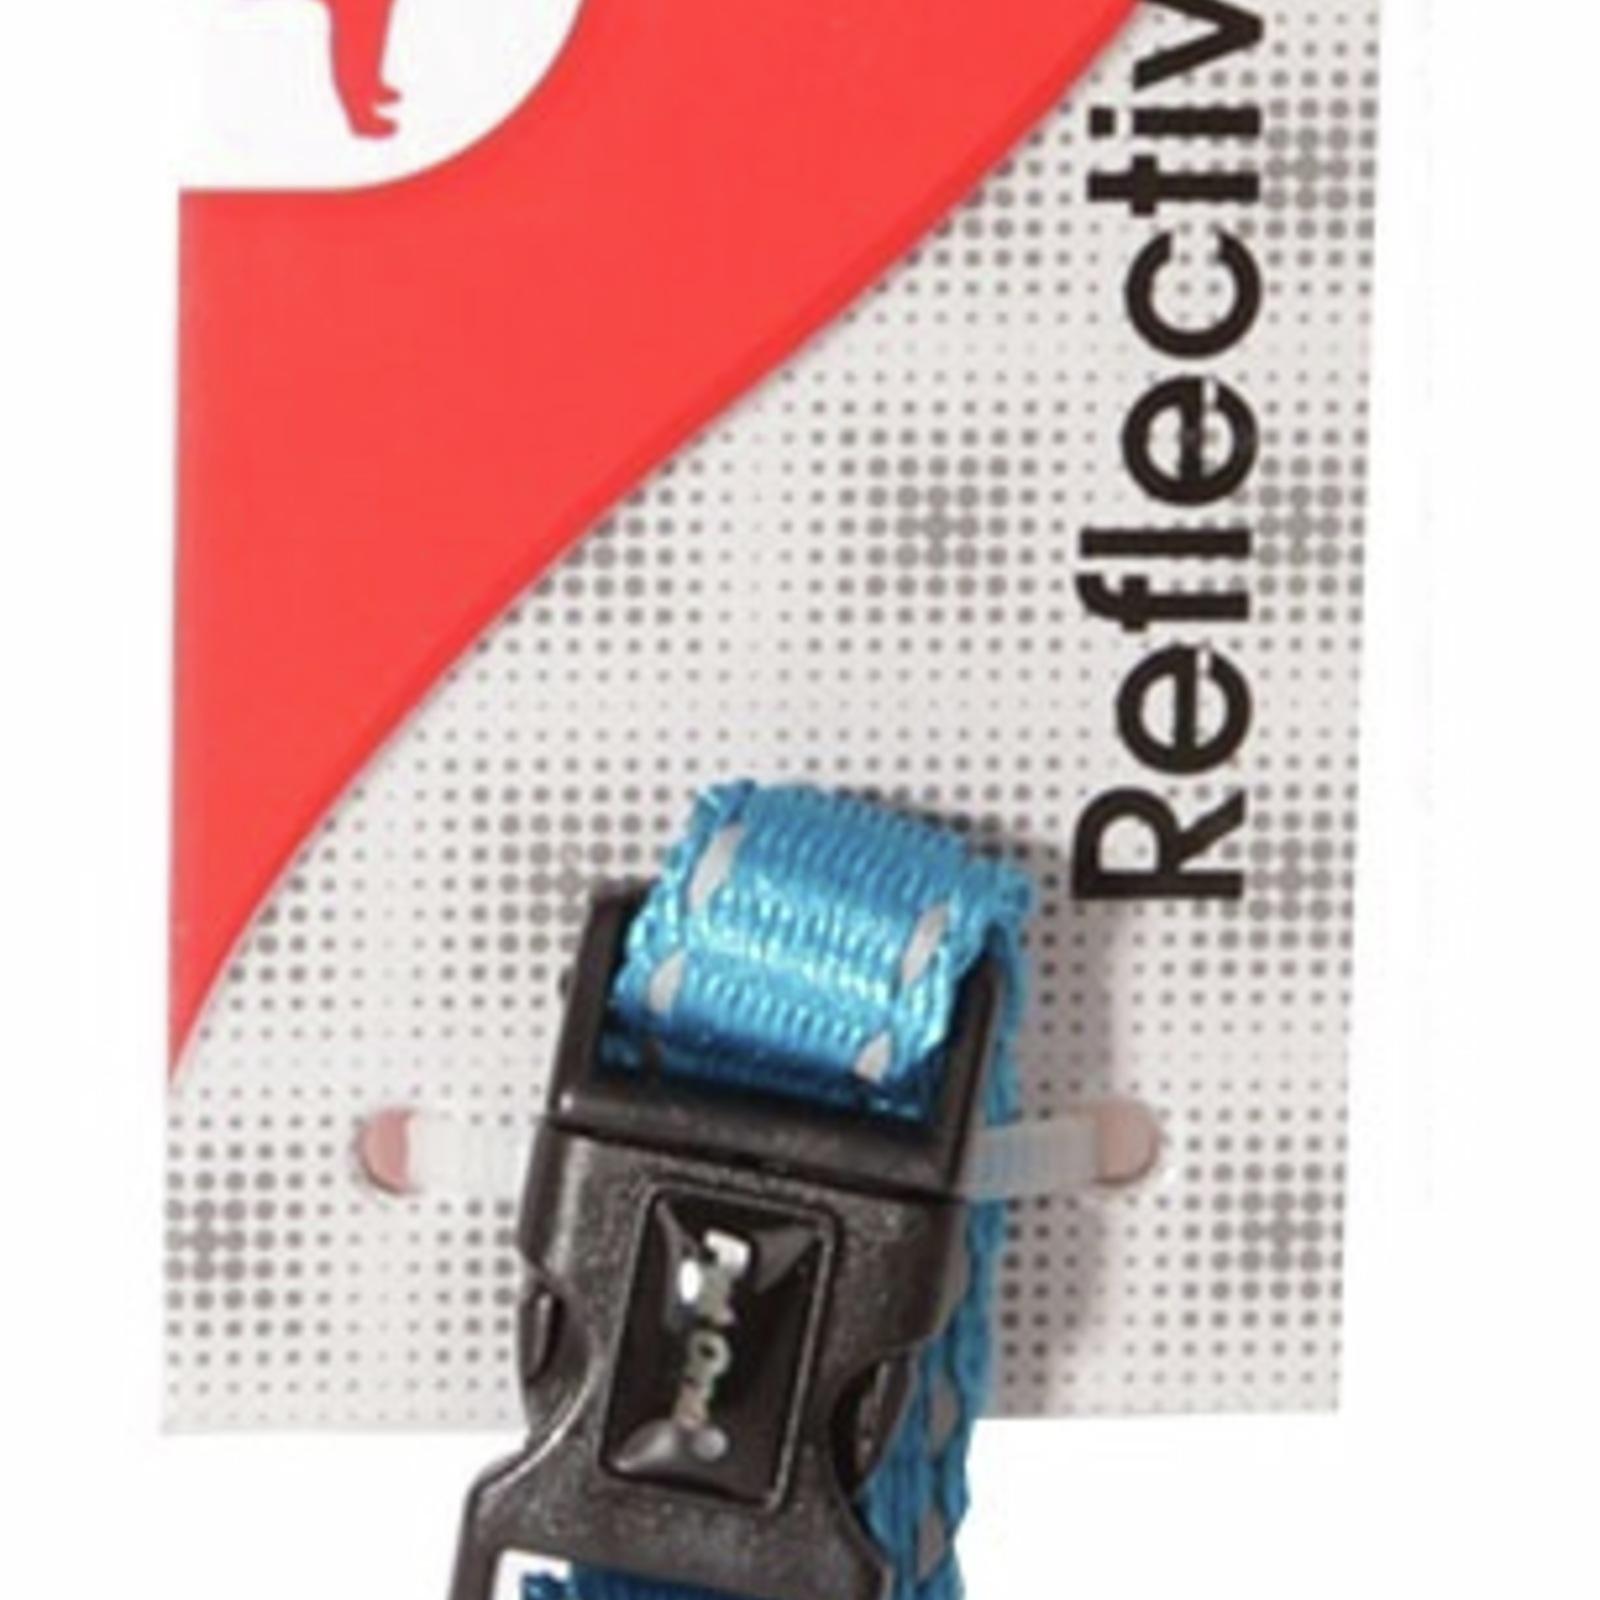 Reflective Adjustable Nylon Dog Collar - 17-26cm (10mm) - Aqua (Pet One)